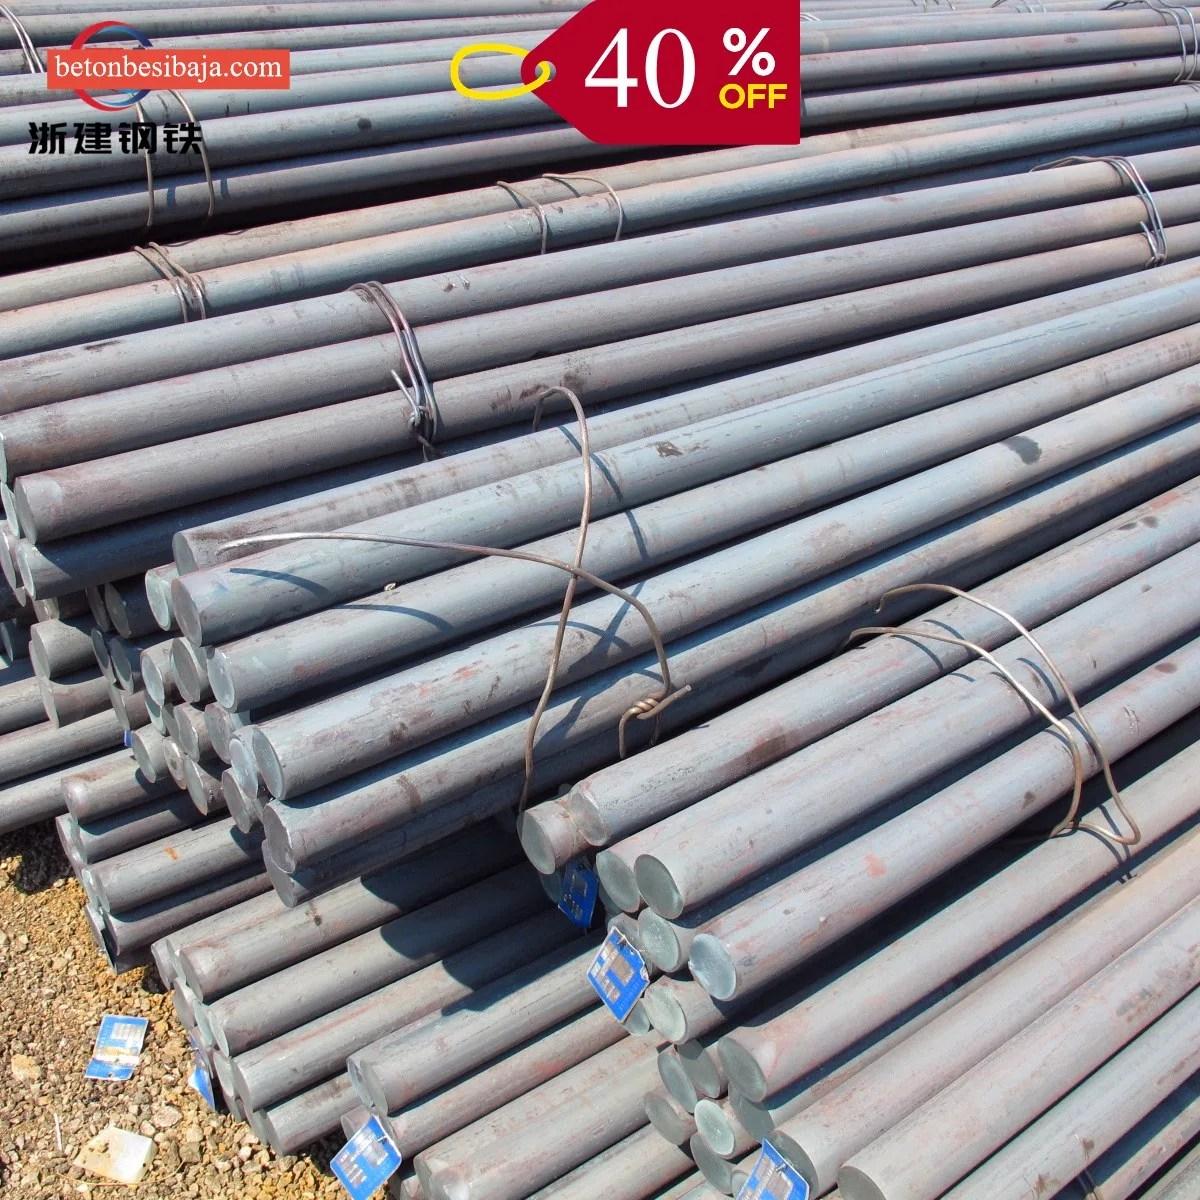 harga baja ringan per batang murah besi beton polos 8mm tangerang depok asia jaya steel